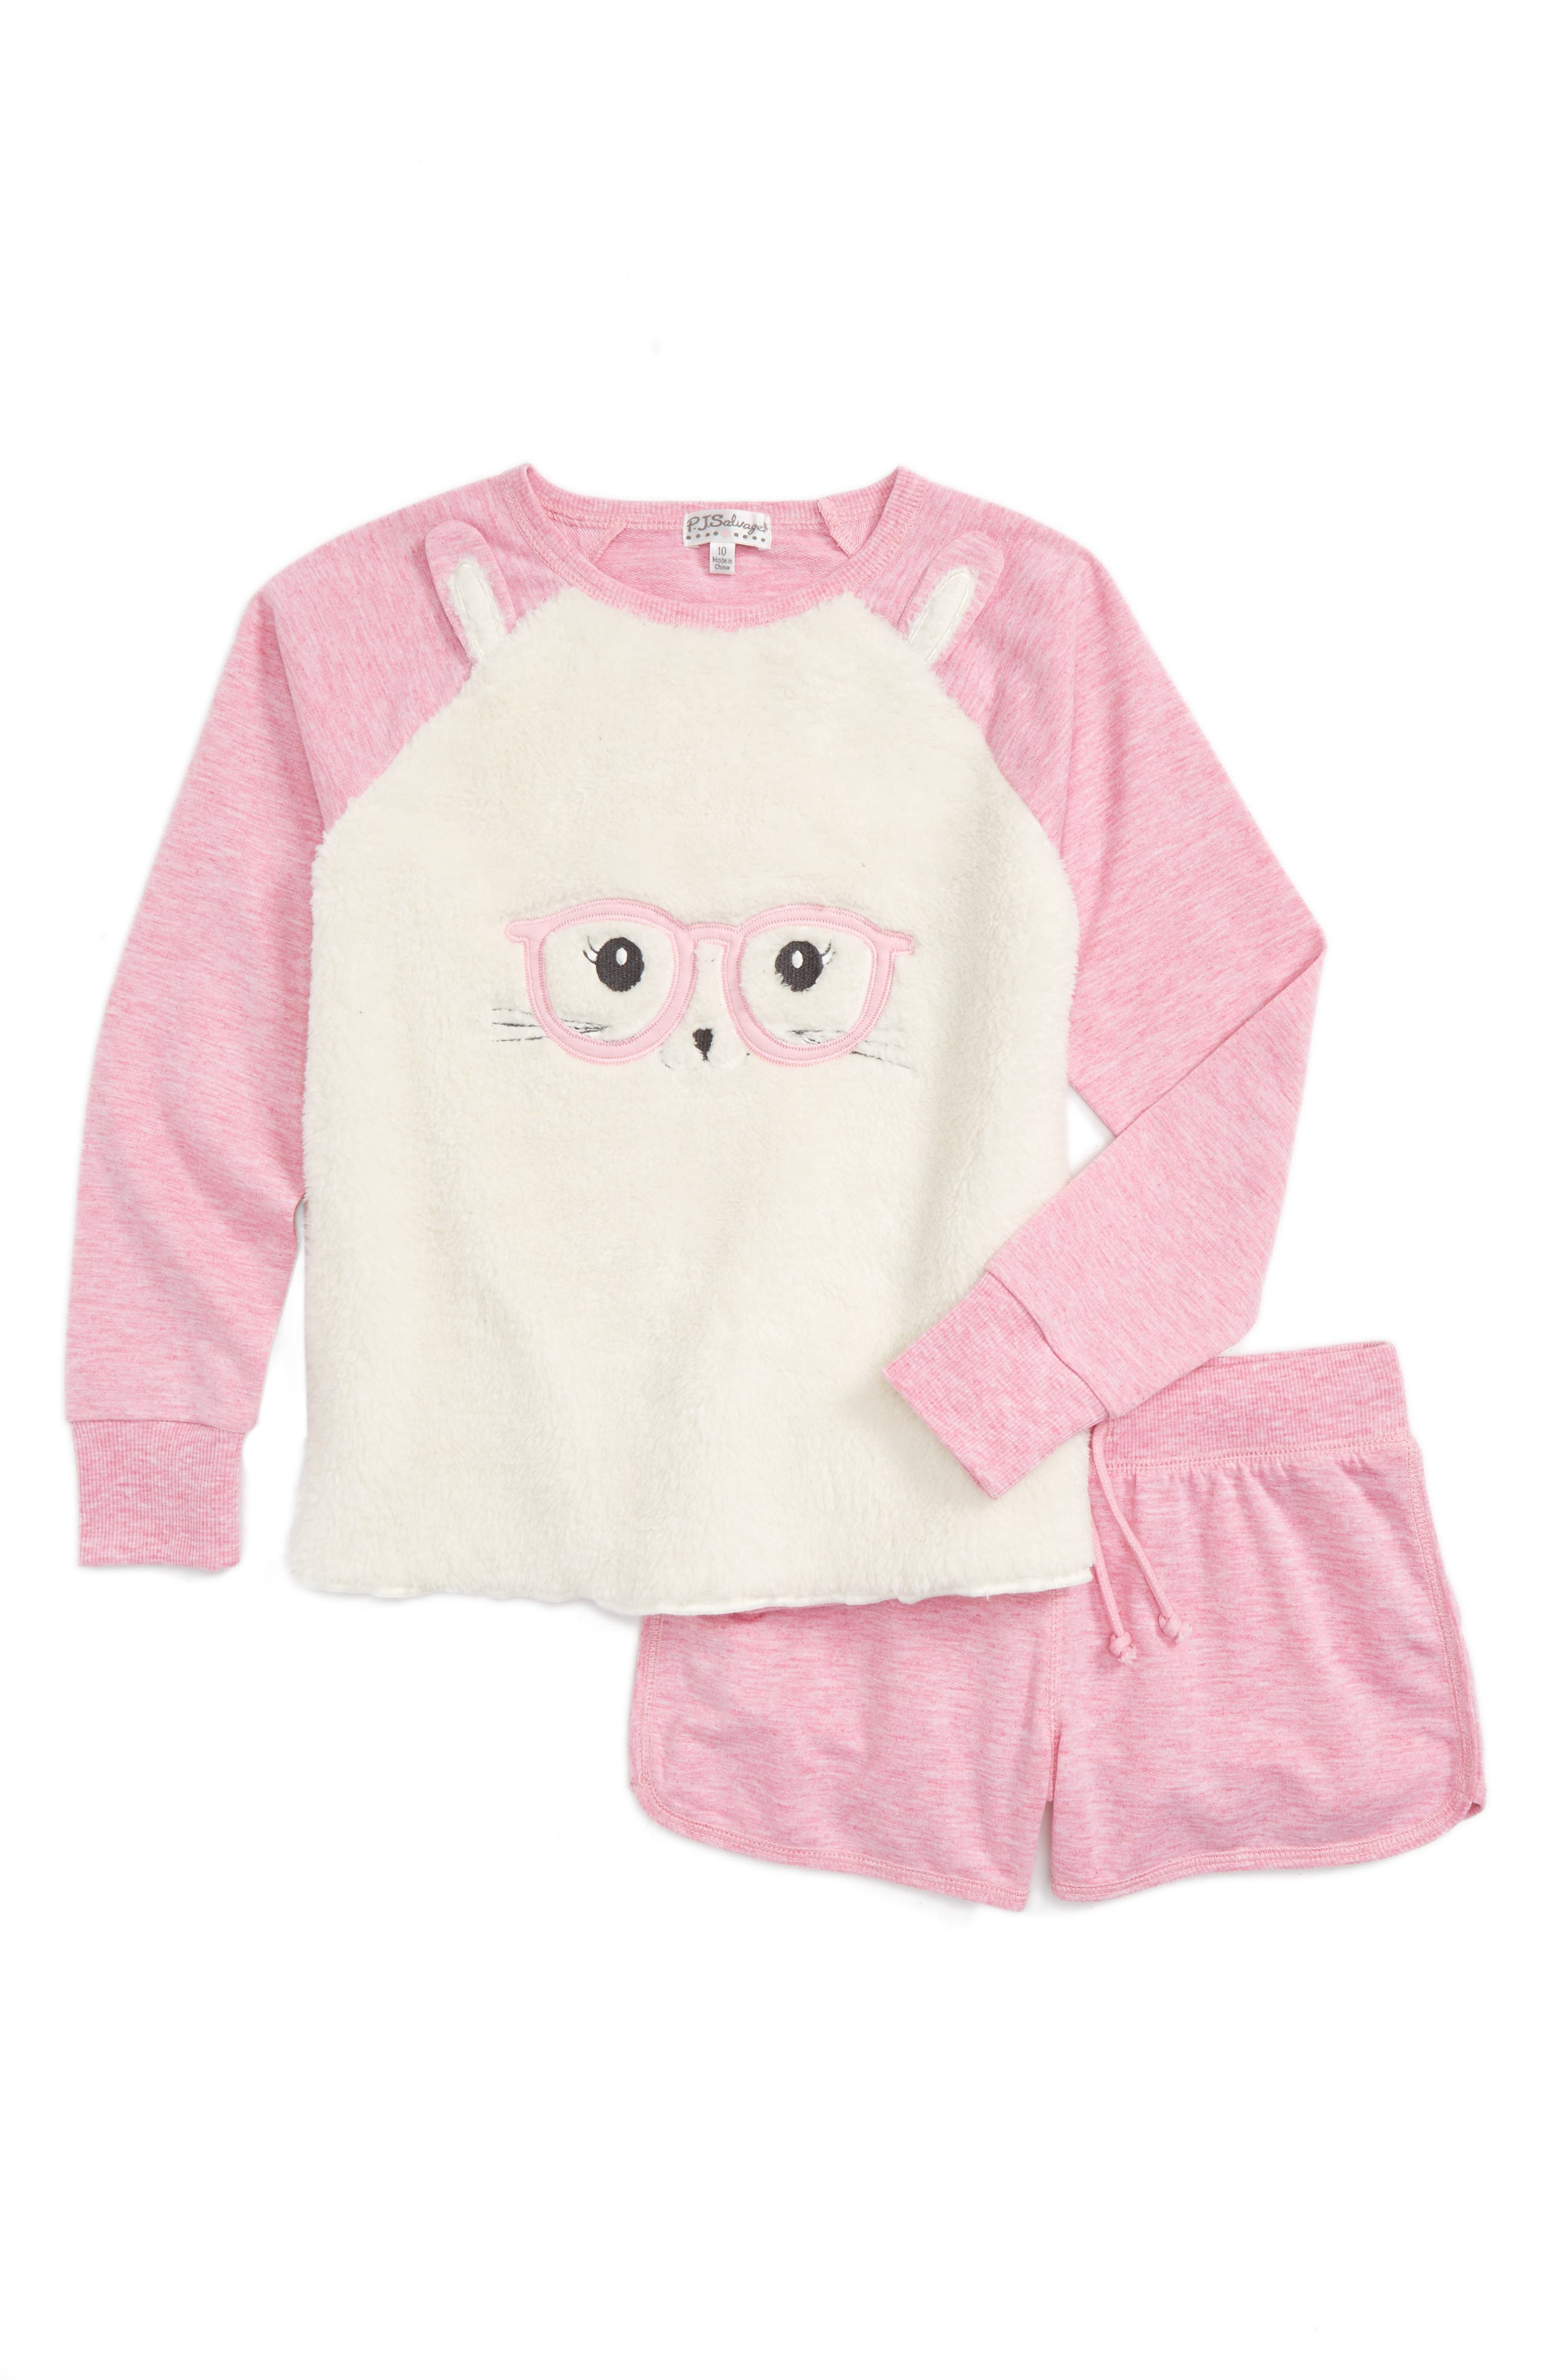 Alternate Image 1 Selected - PJ Salvage Patches Two-Piece Pajamas (Big Girls)